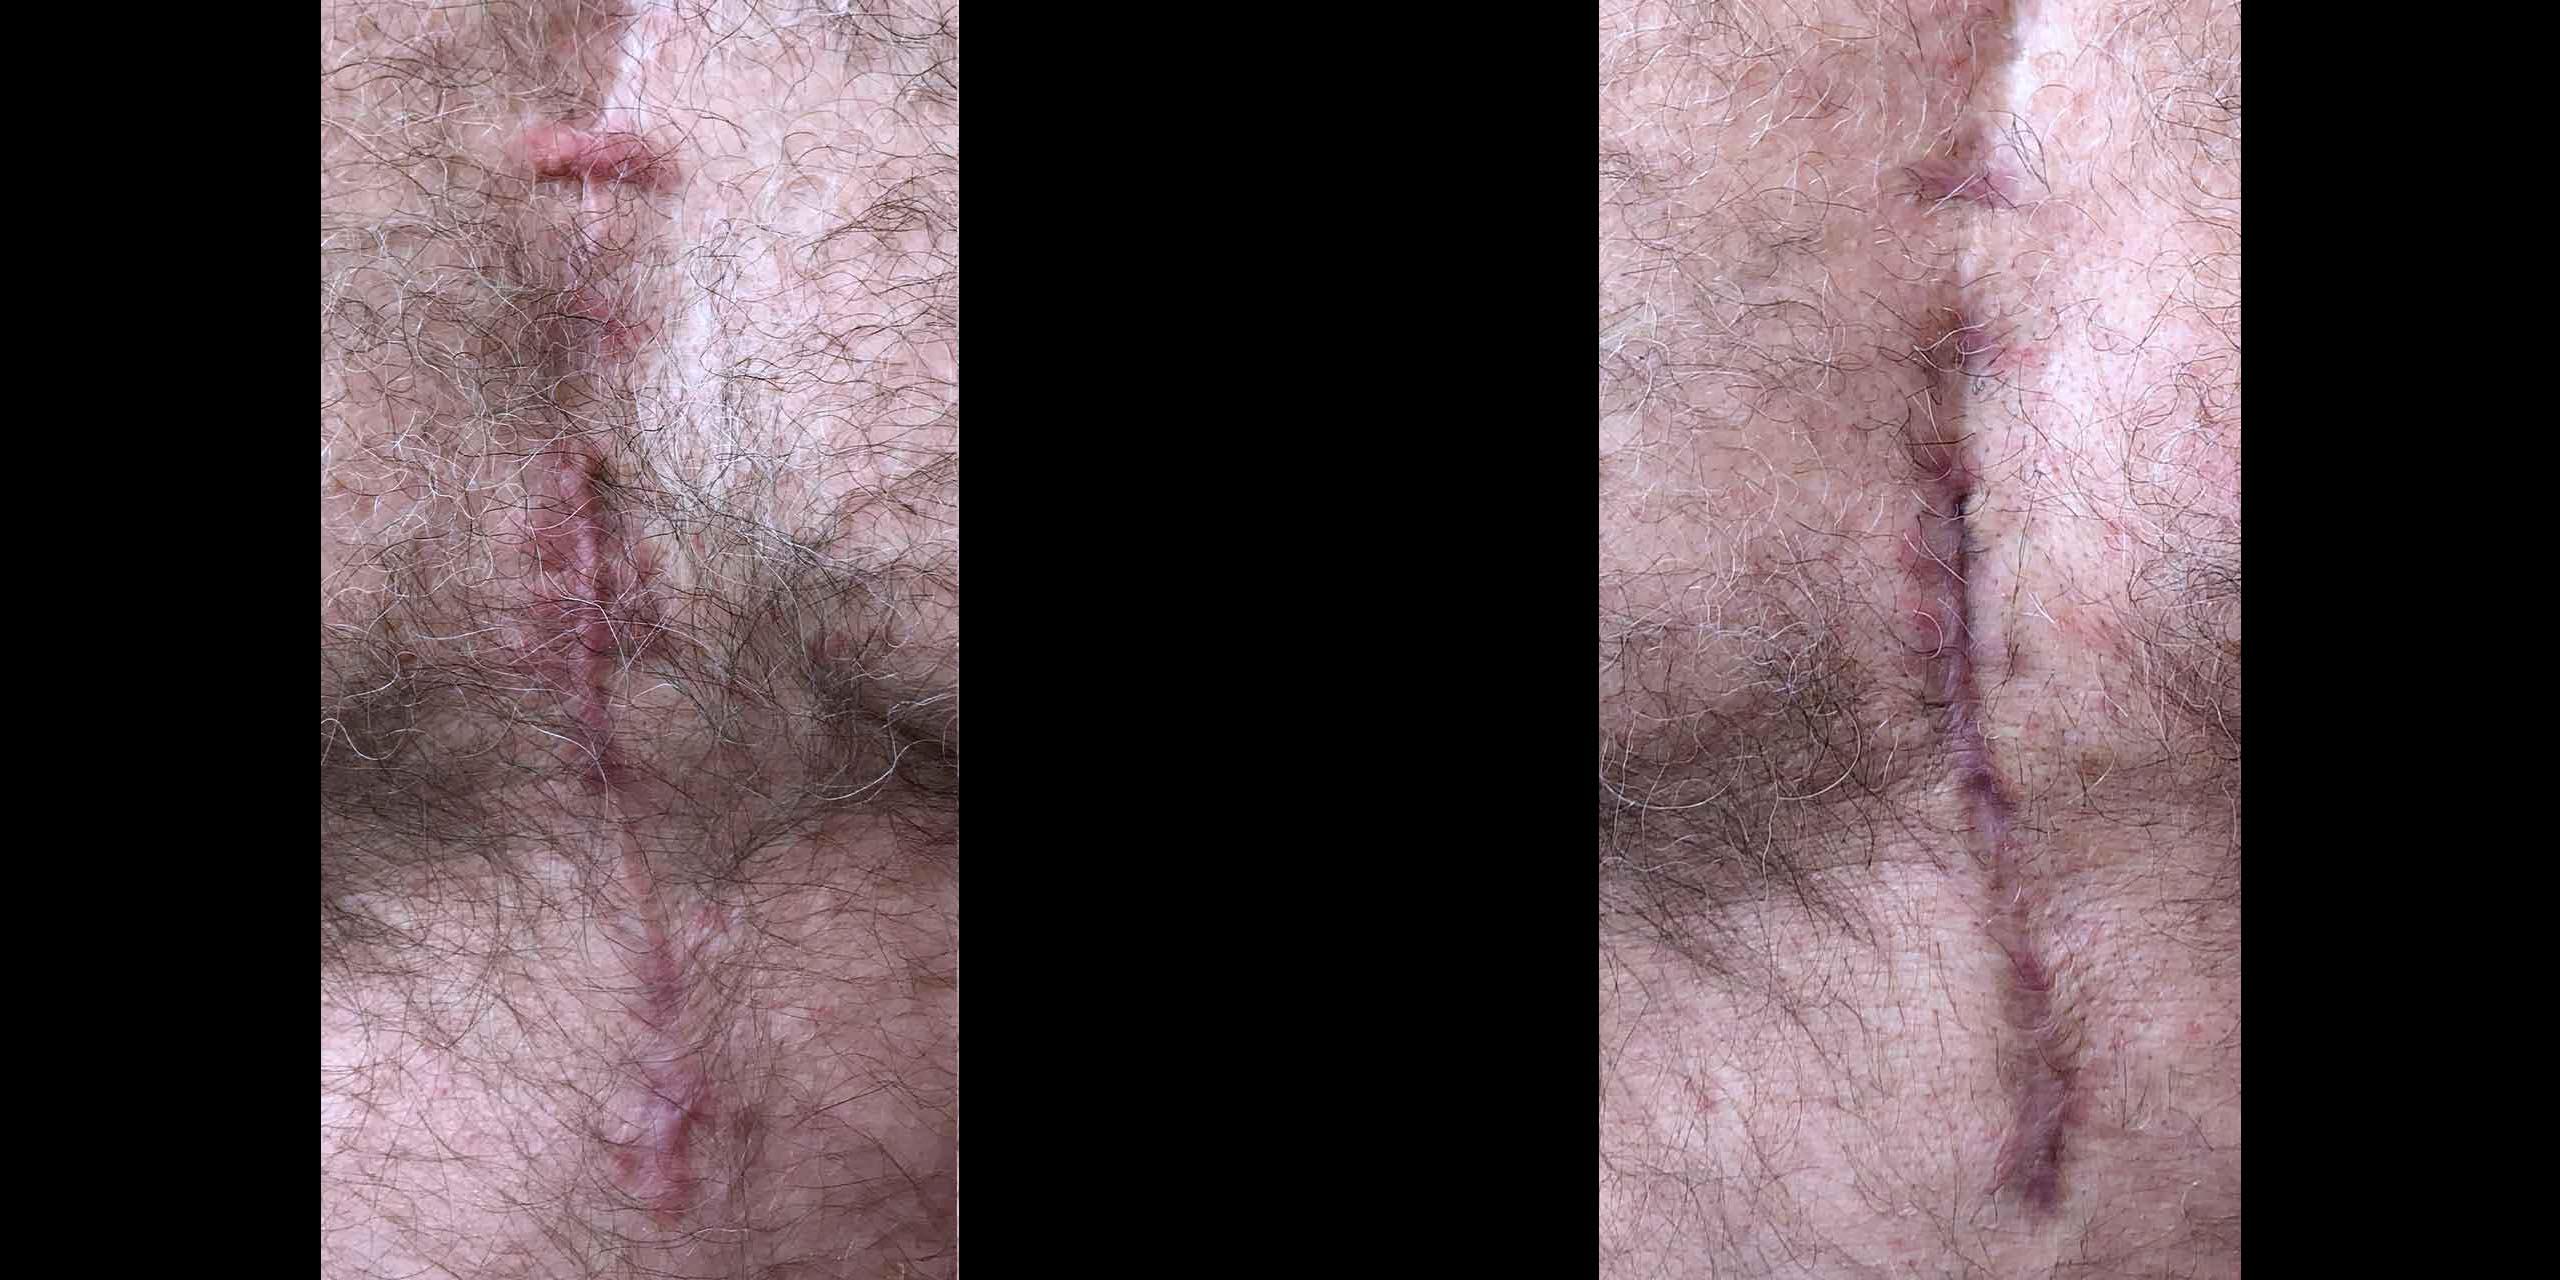 Vascular Lasers for Redness & Veins using VBeam by Dr. Hooman Khorasani